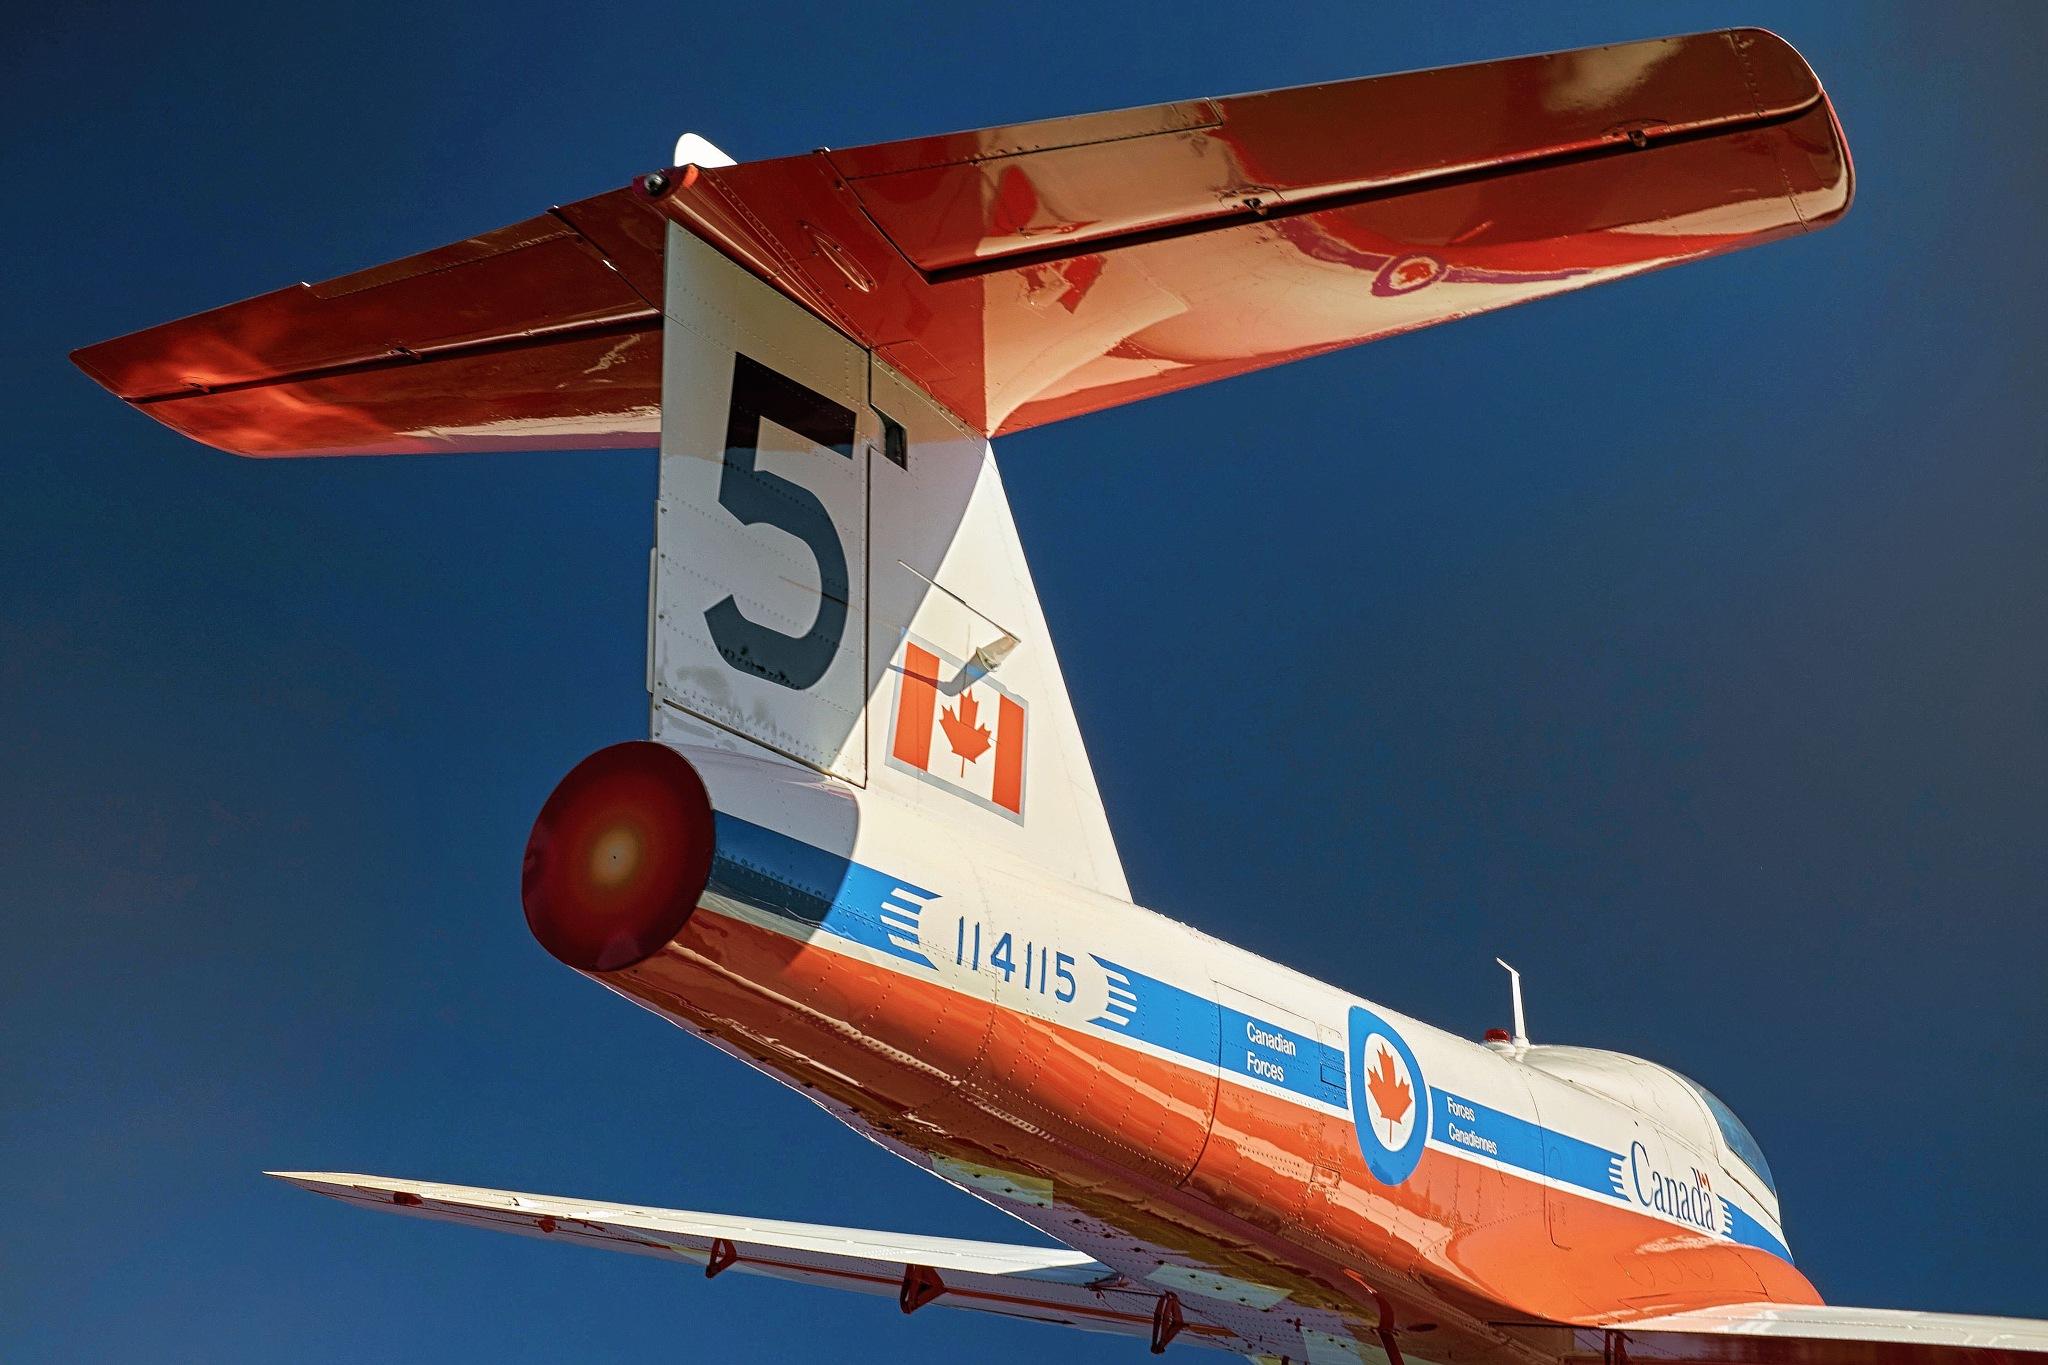 Snowbirds' Plane by Greg Mullaly